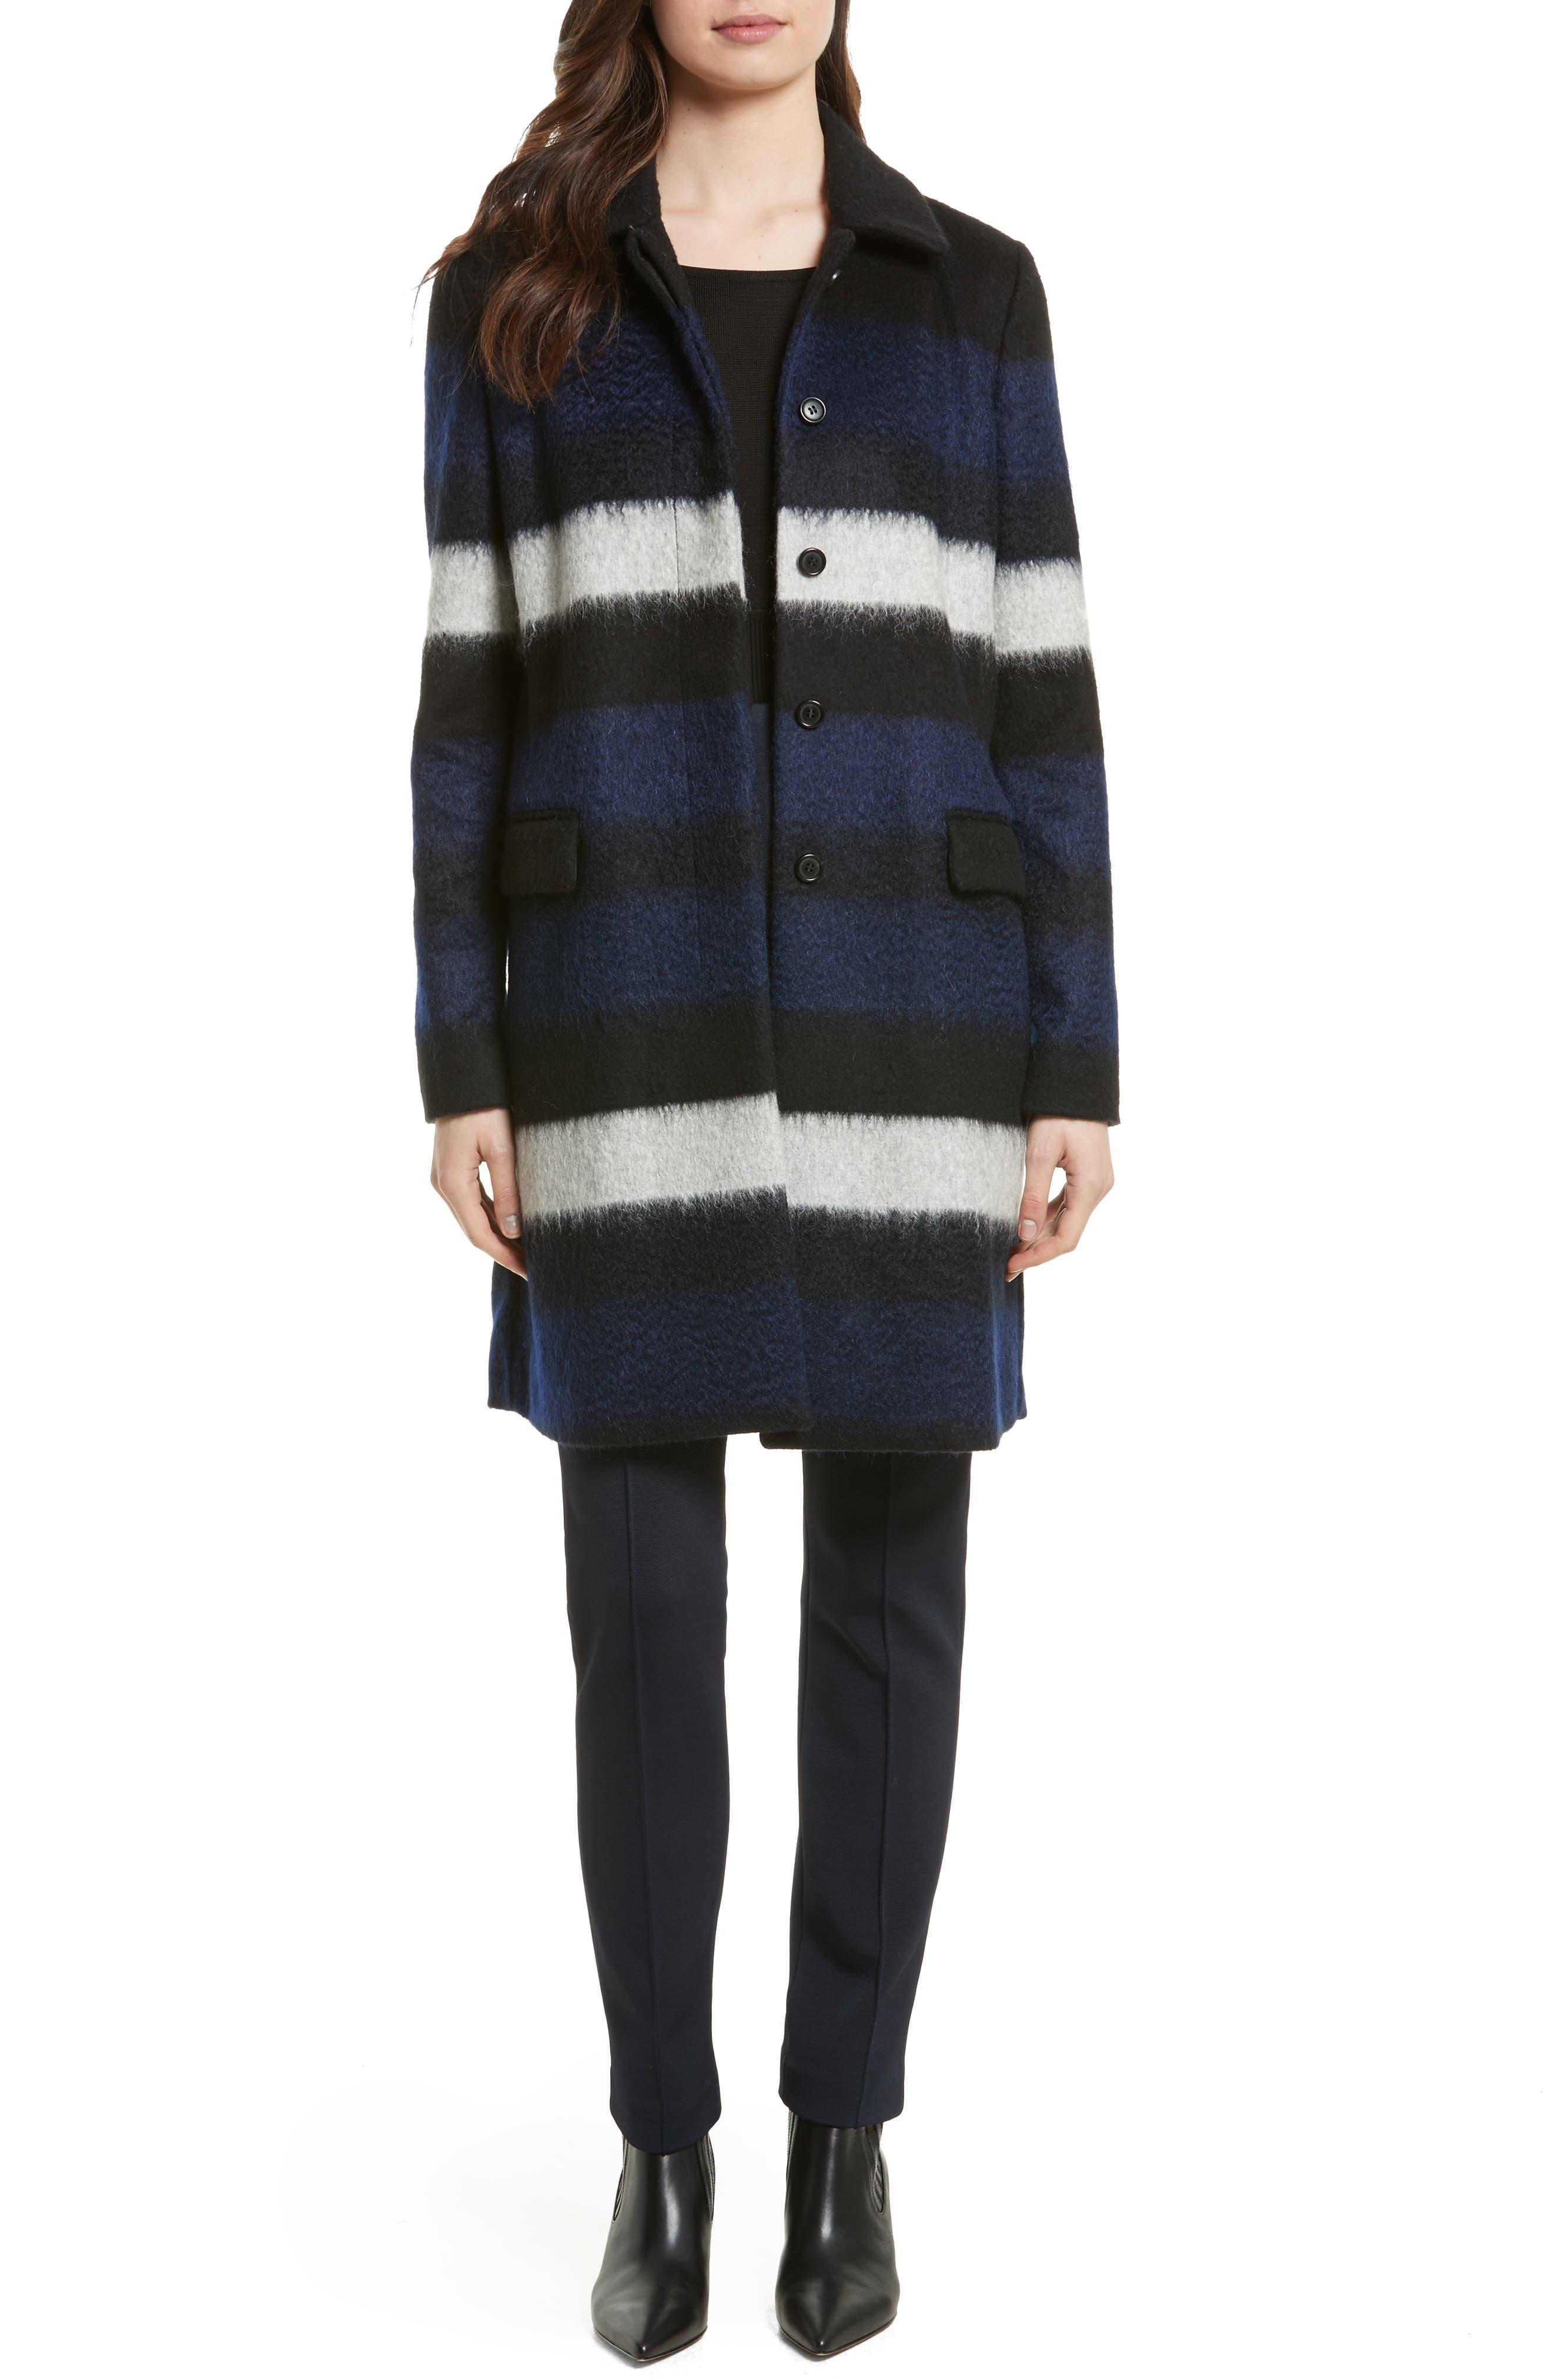 DIANE VON FURSTENBERG,                             Stripe Wool Blend Coat,                             Alternate thumbnail 6, color,                             005